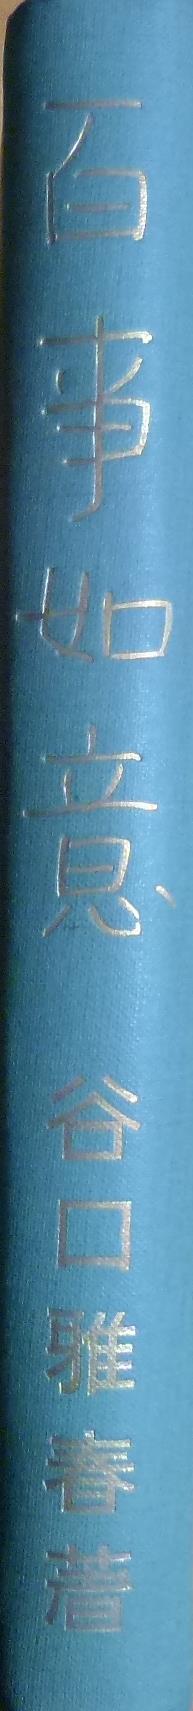 P1190966